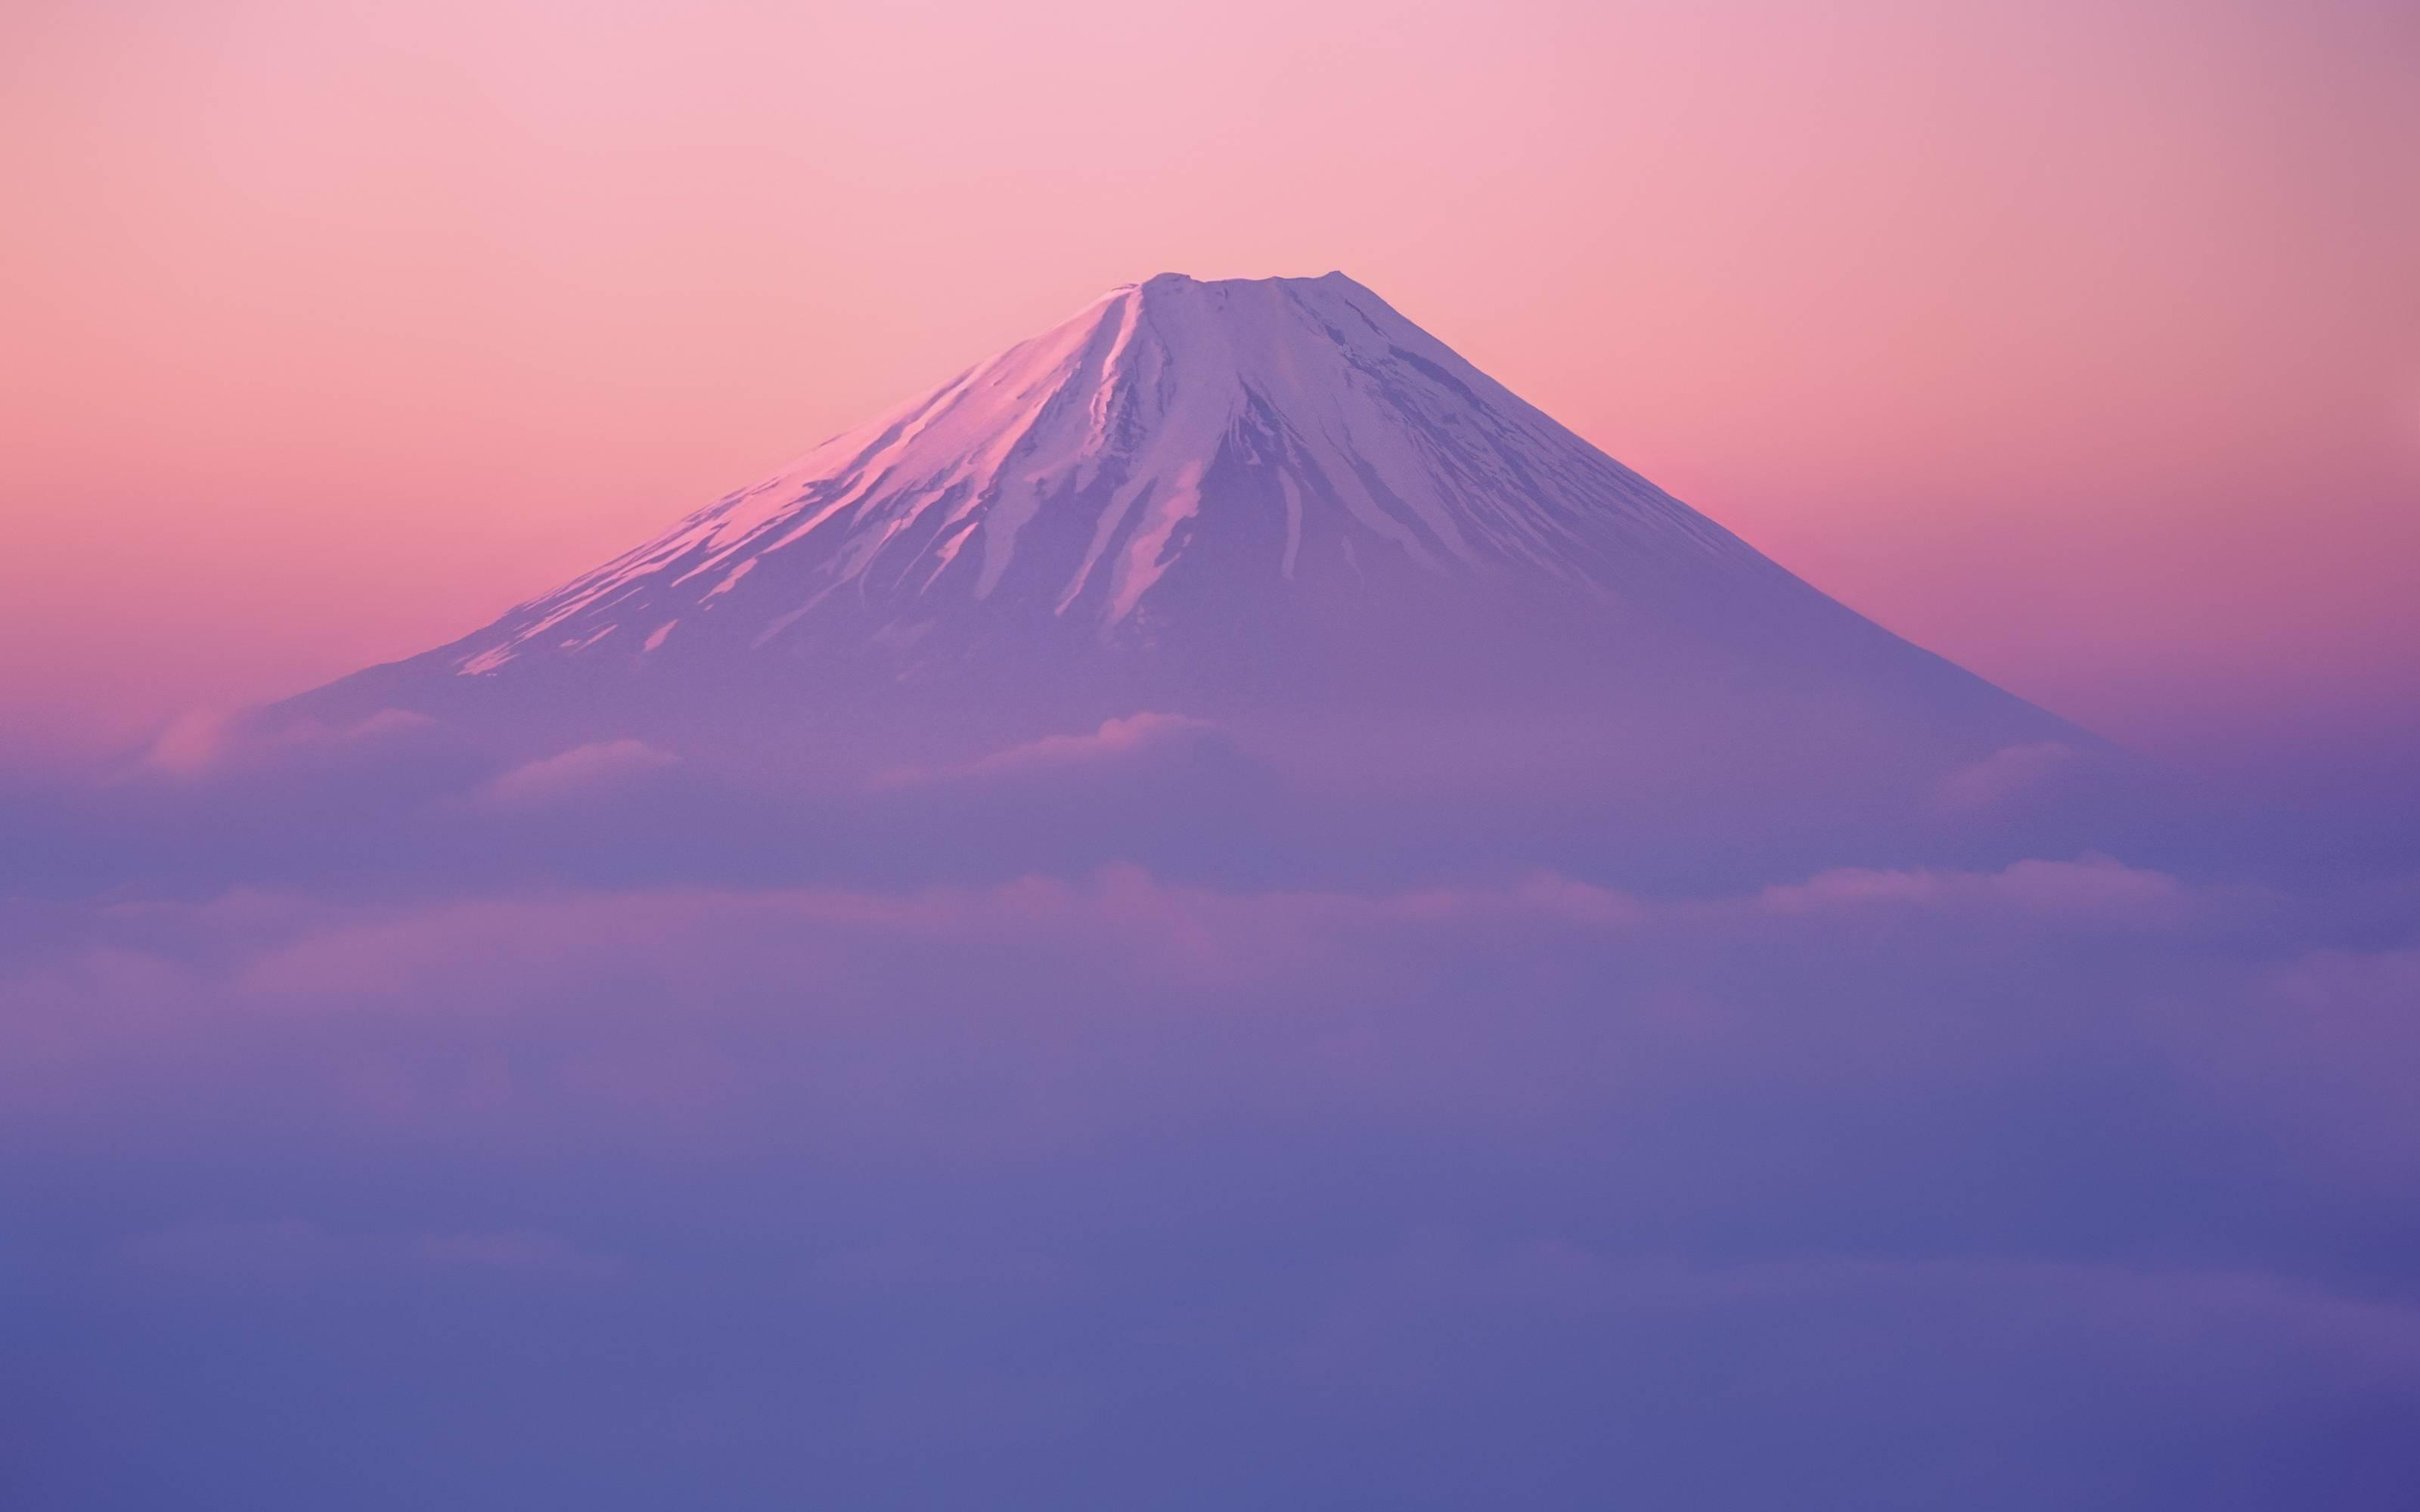 New Mt Fuji Wallpaper in Mac OS X Lion Developer Preview 2